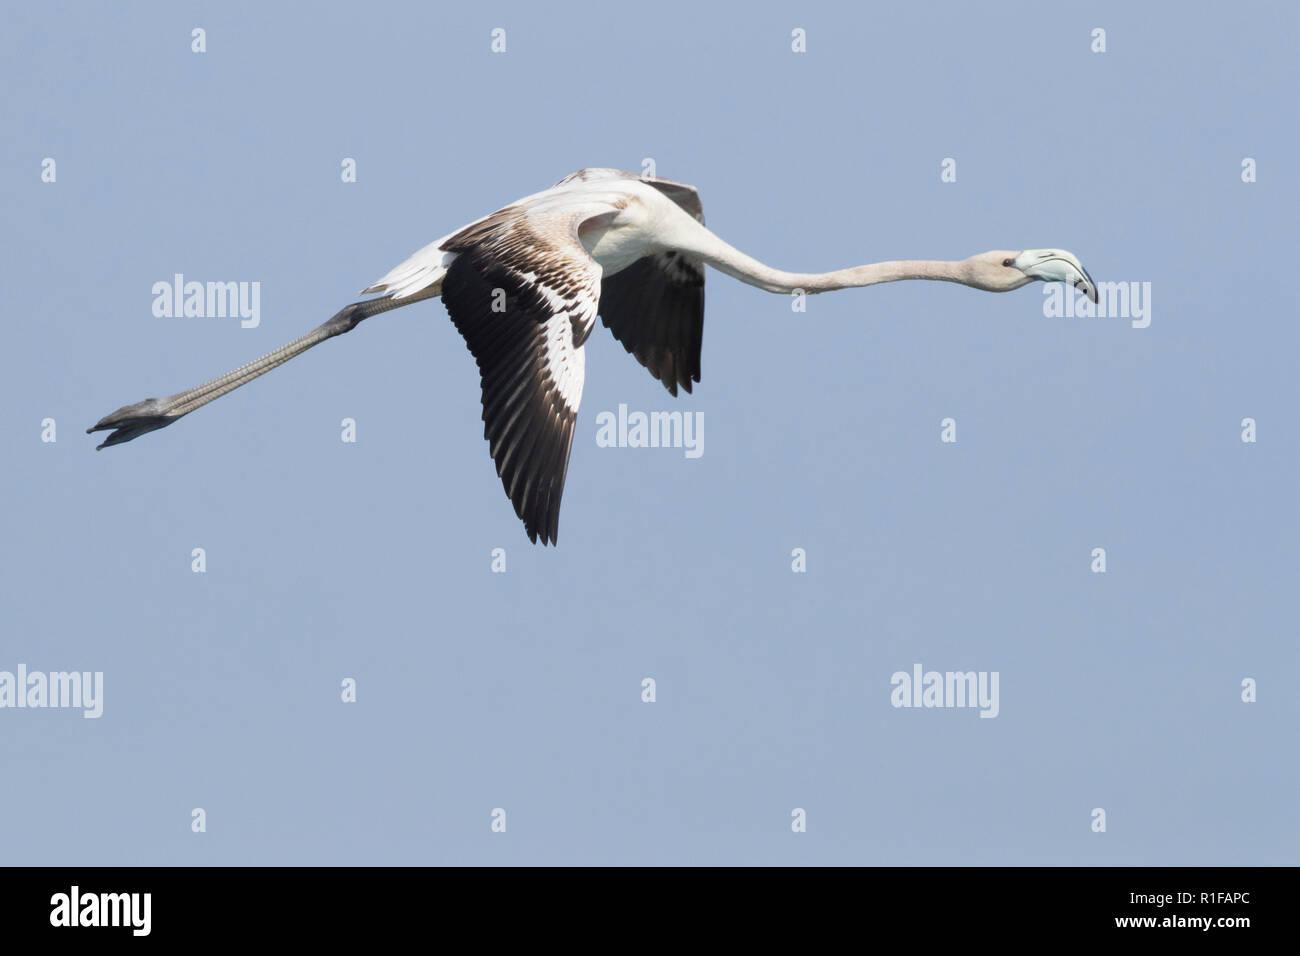 Mehr Flamingo (Phoenicopterus Roseus), juvenile im Flug Oberseite angezeigt Stockbild